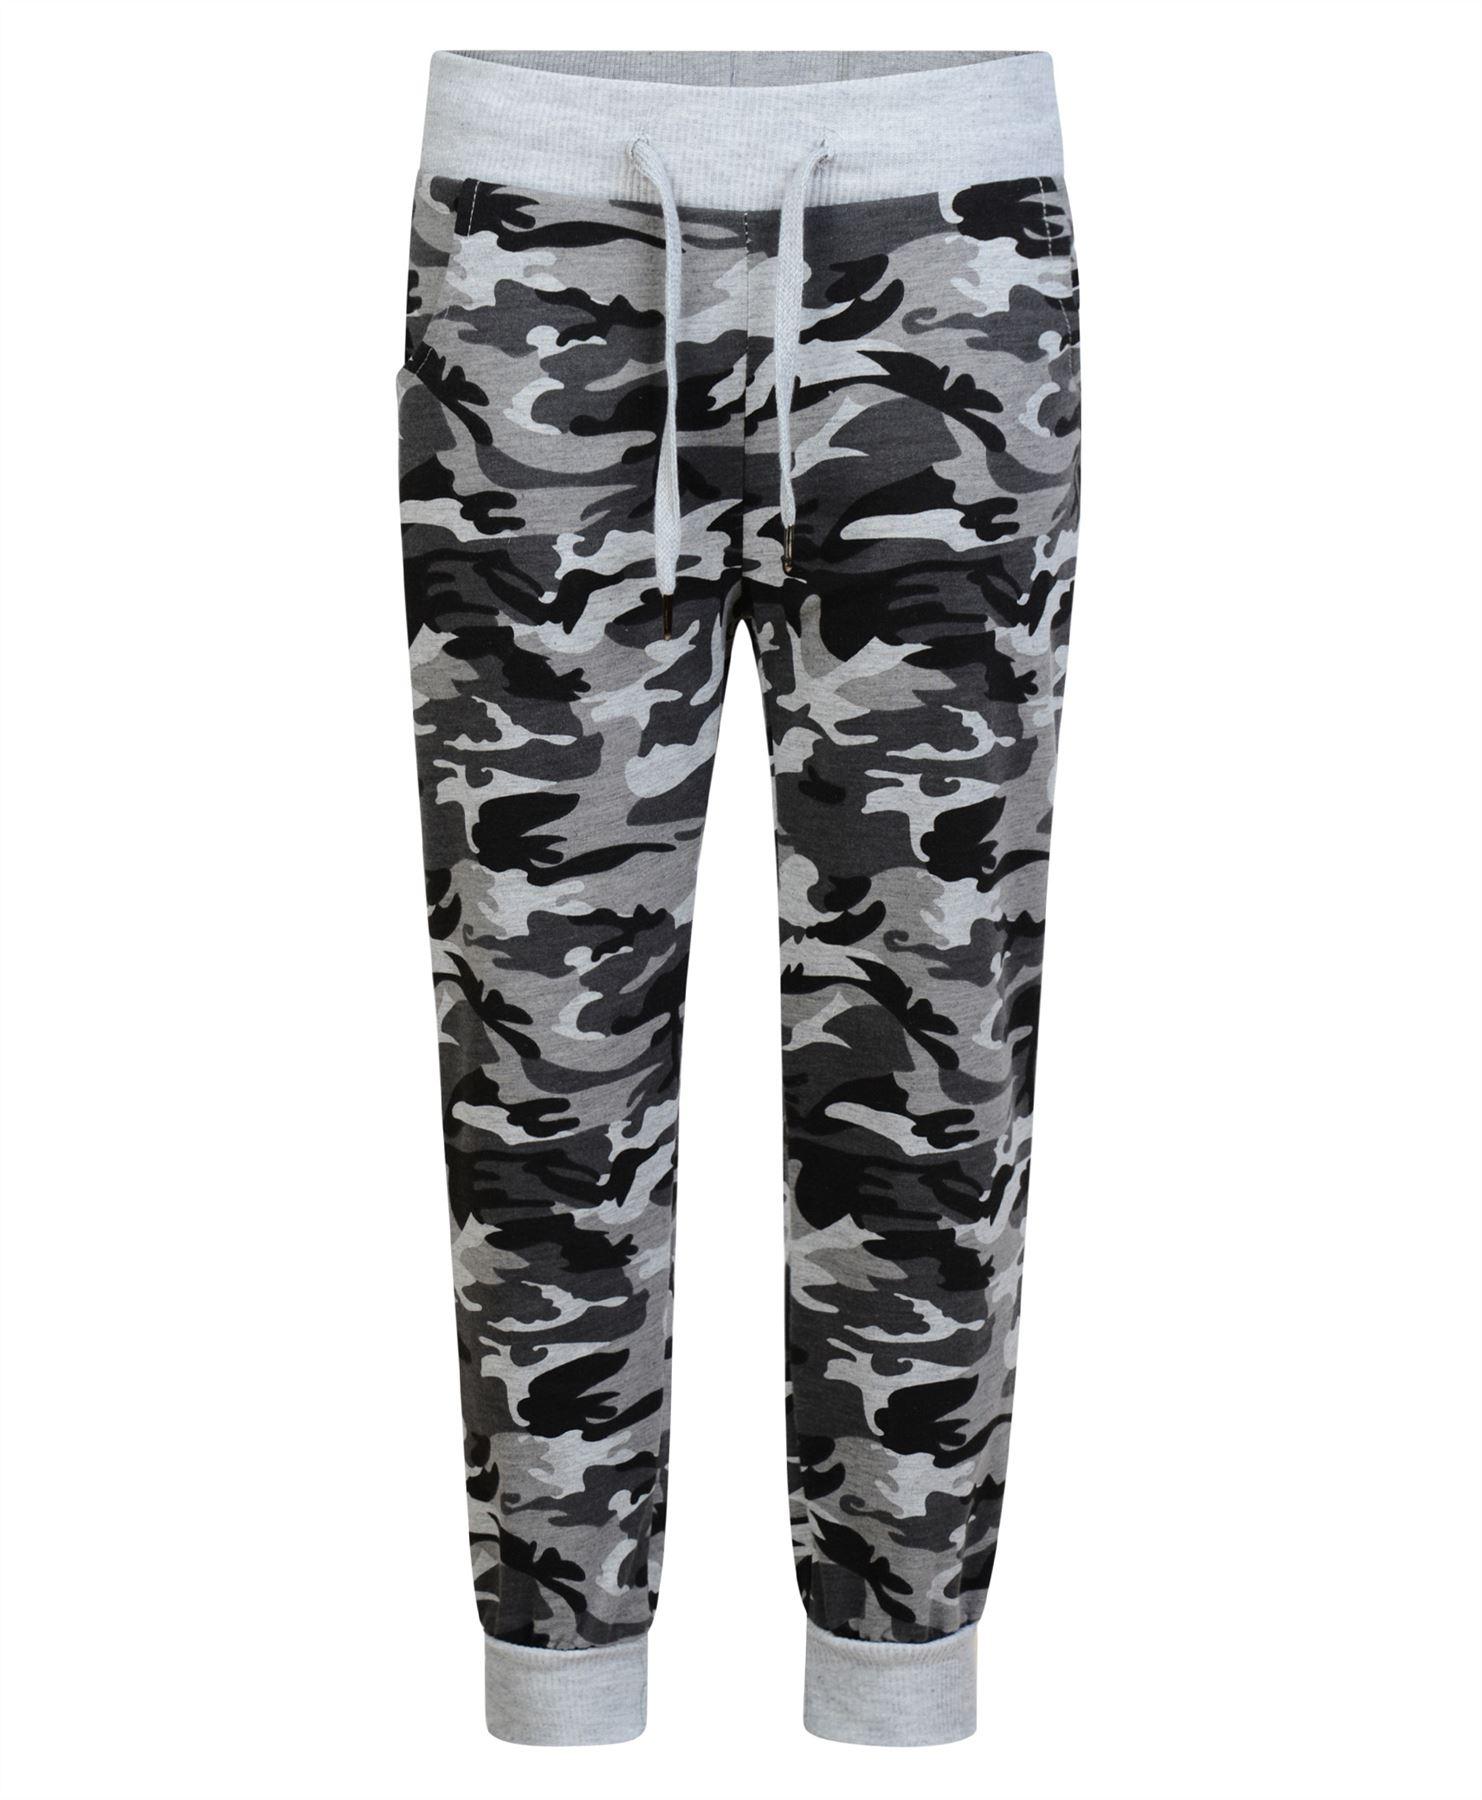 Men's Pants & Denim Showing: 31 Items Sort: Mens Pants Fit Guide. Modern (8) Standard Camo (1) Denim Fit. V16 Slim (4) V56 Standard (4) V76 Skinny (4) V96 Relaxed (1) Men's Bottom Size. 28 Inch (16) 29 Inch (15) 30 Inch (17) 31 Inch (12) 32 Inch (16) 33 Inch (13) 34 Inch (17) 35 Inch (1).